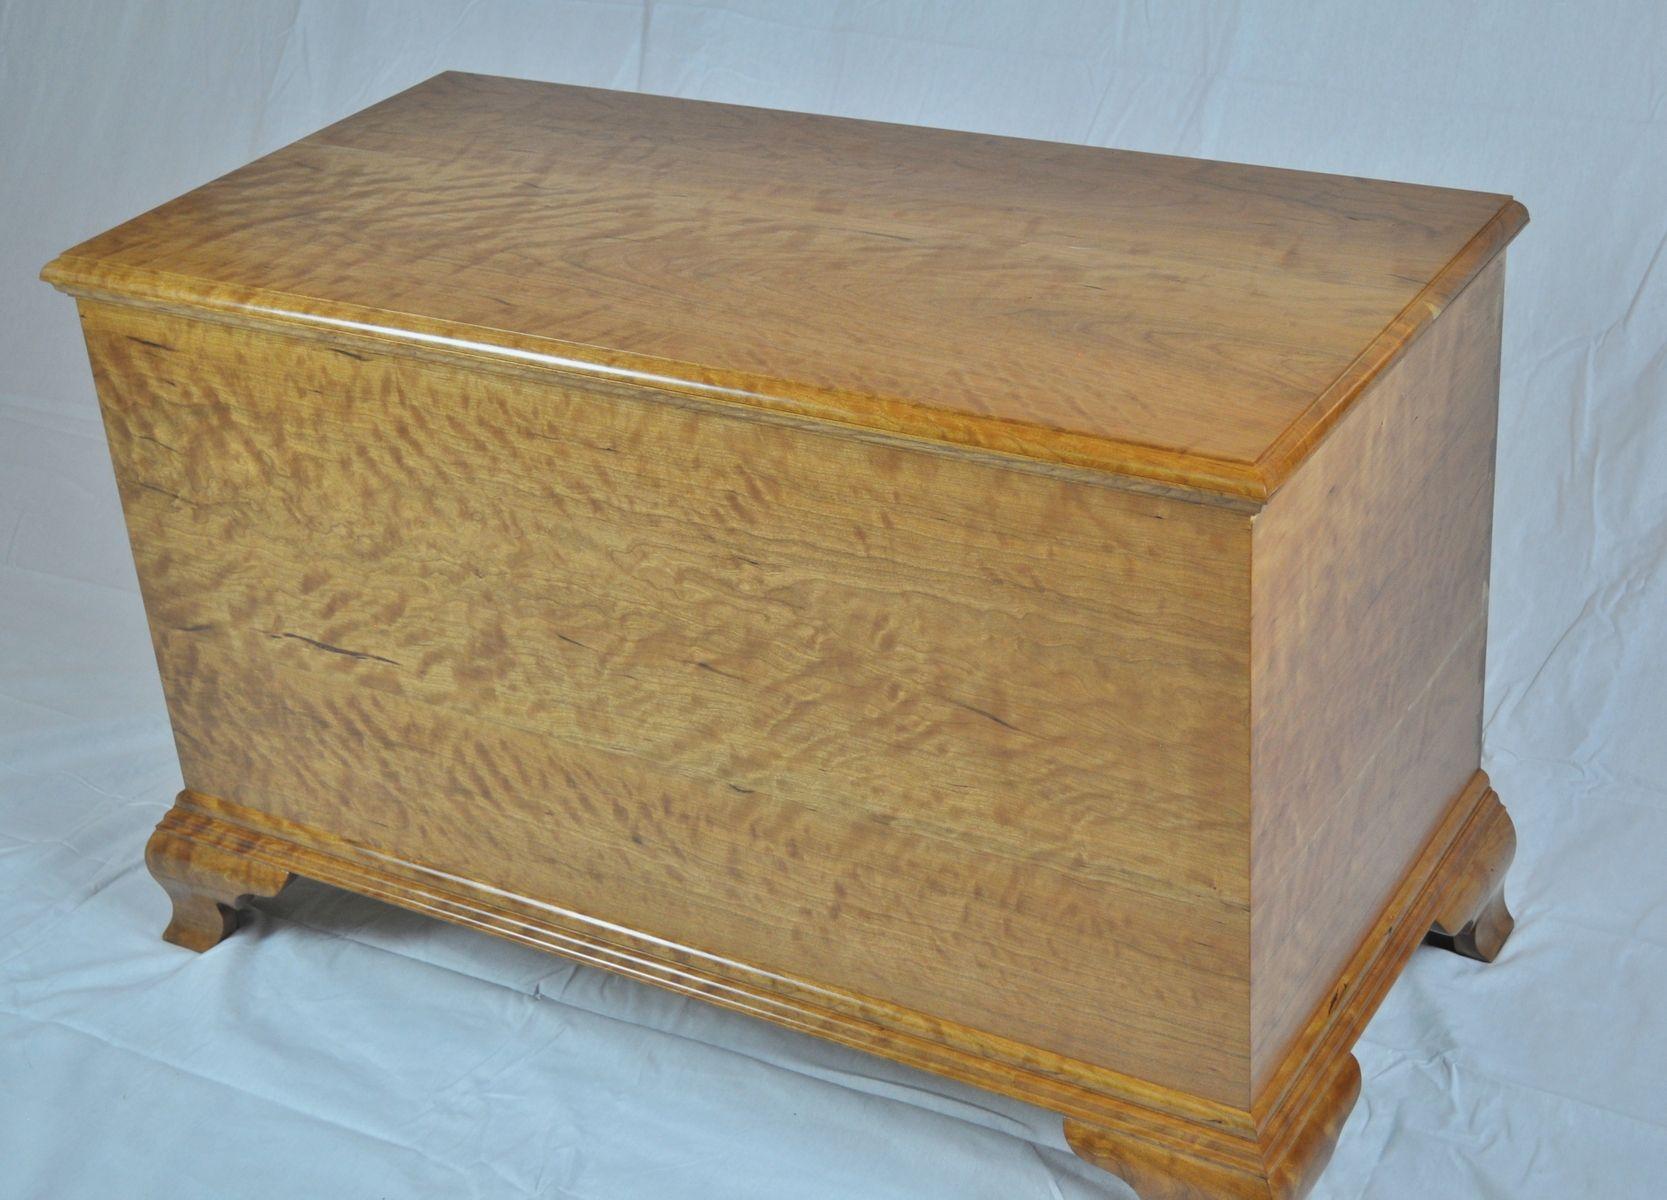 Handmade blanket chest by k smith custom woodworking for Blanket chest designs